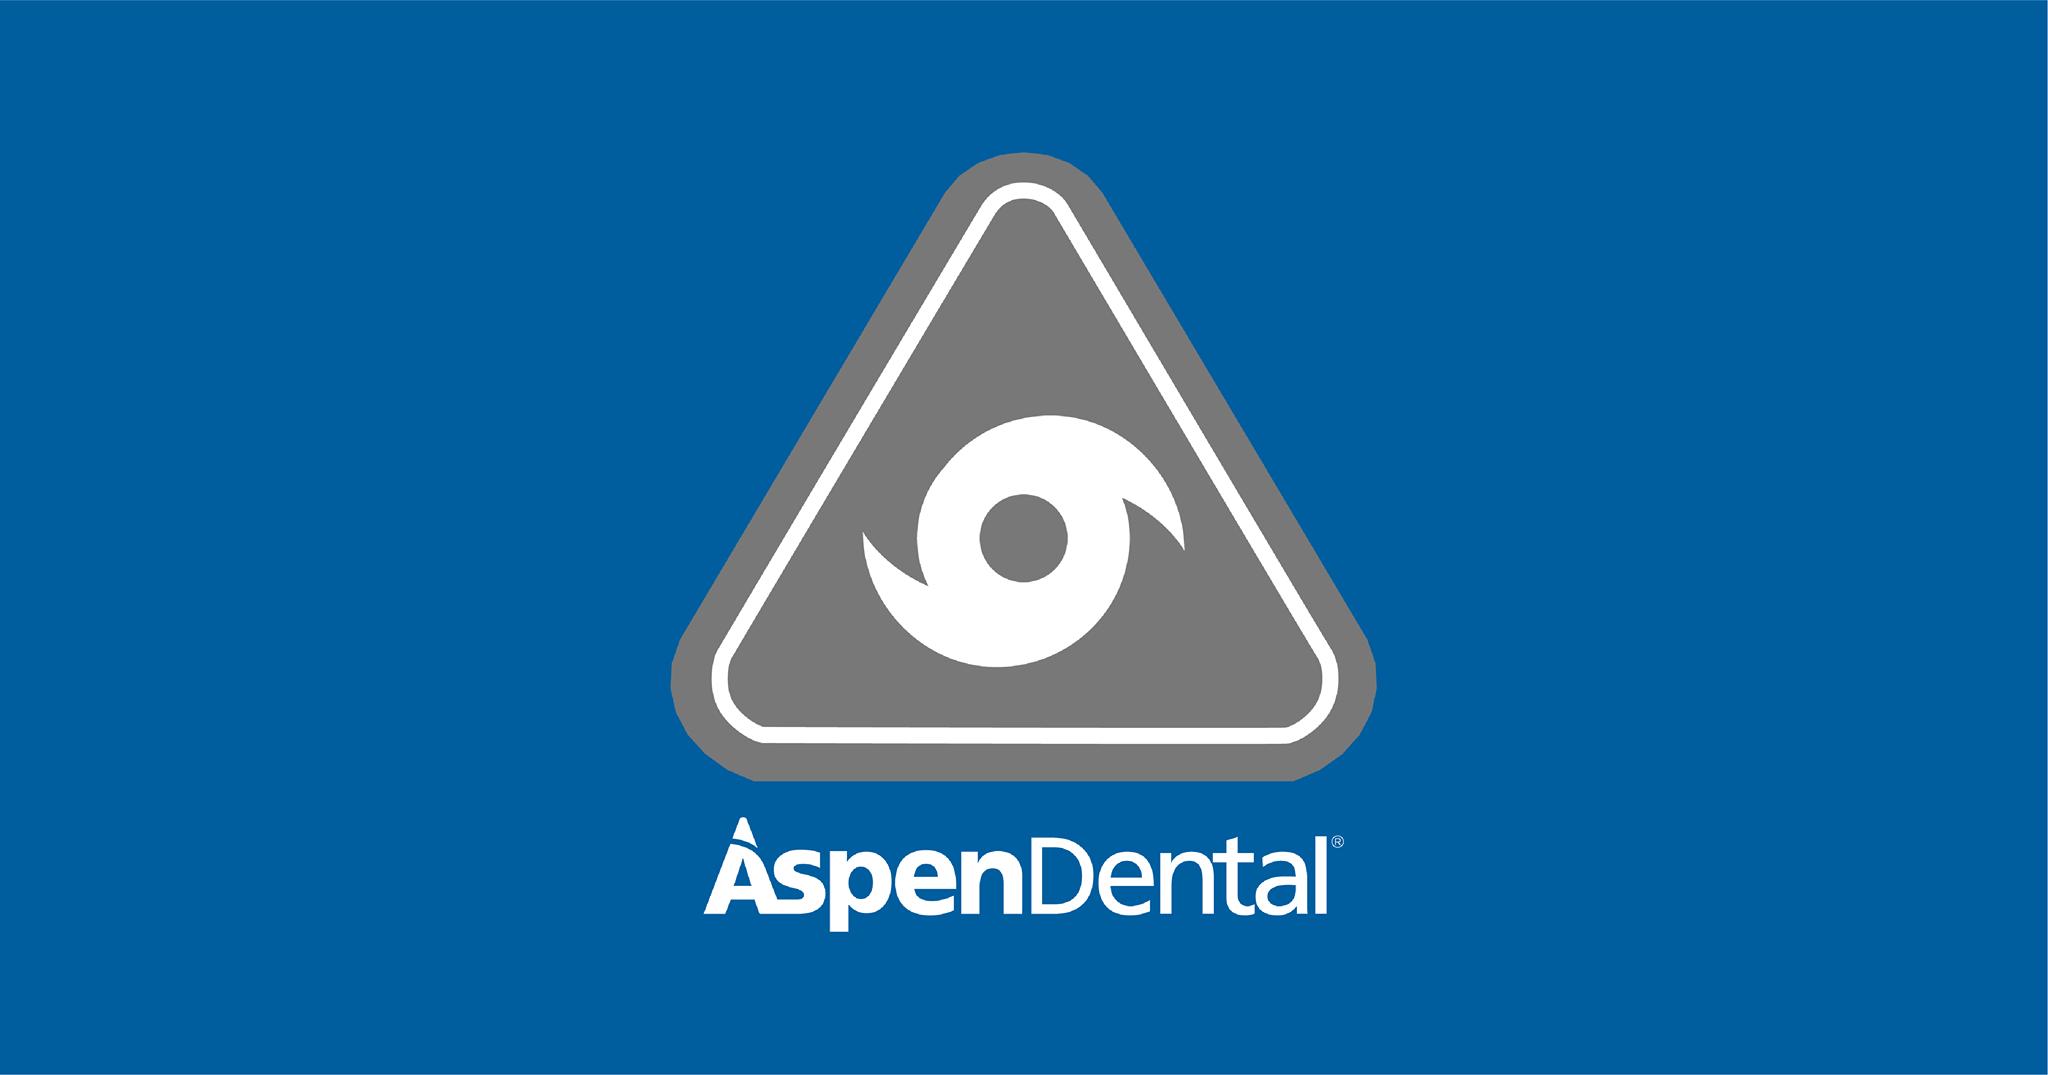 Aspen Dental 1209 N Retail Ct, Myrtle Beach